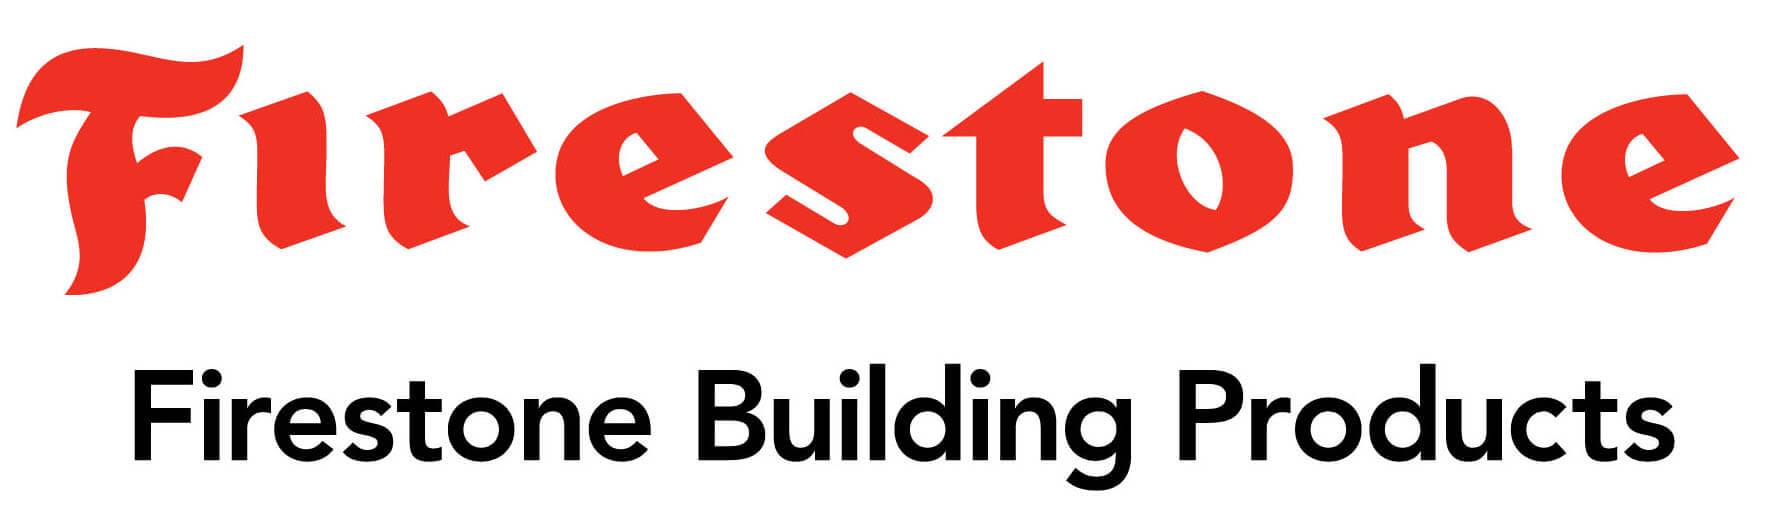 firestone-logo-3